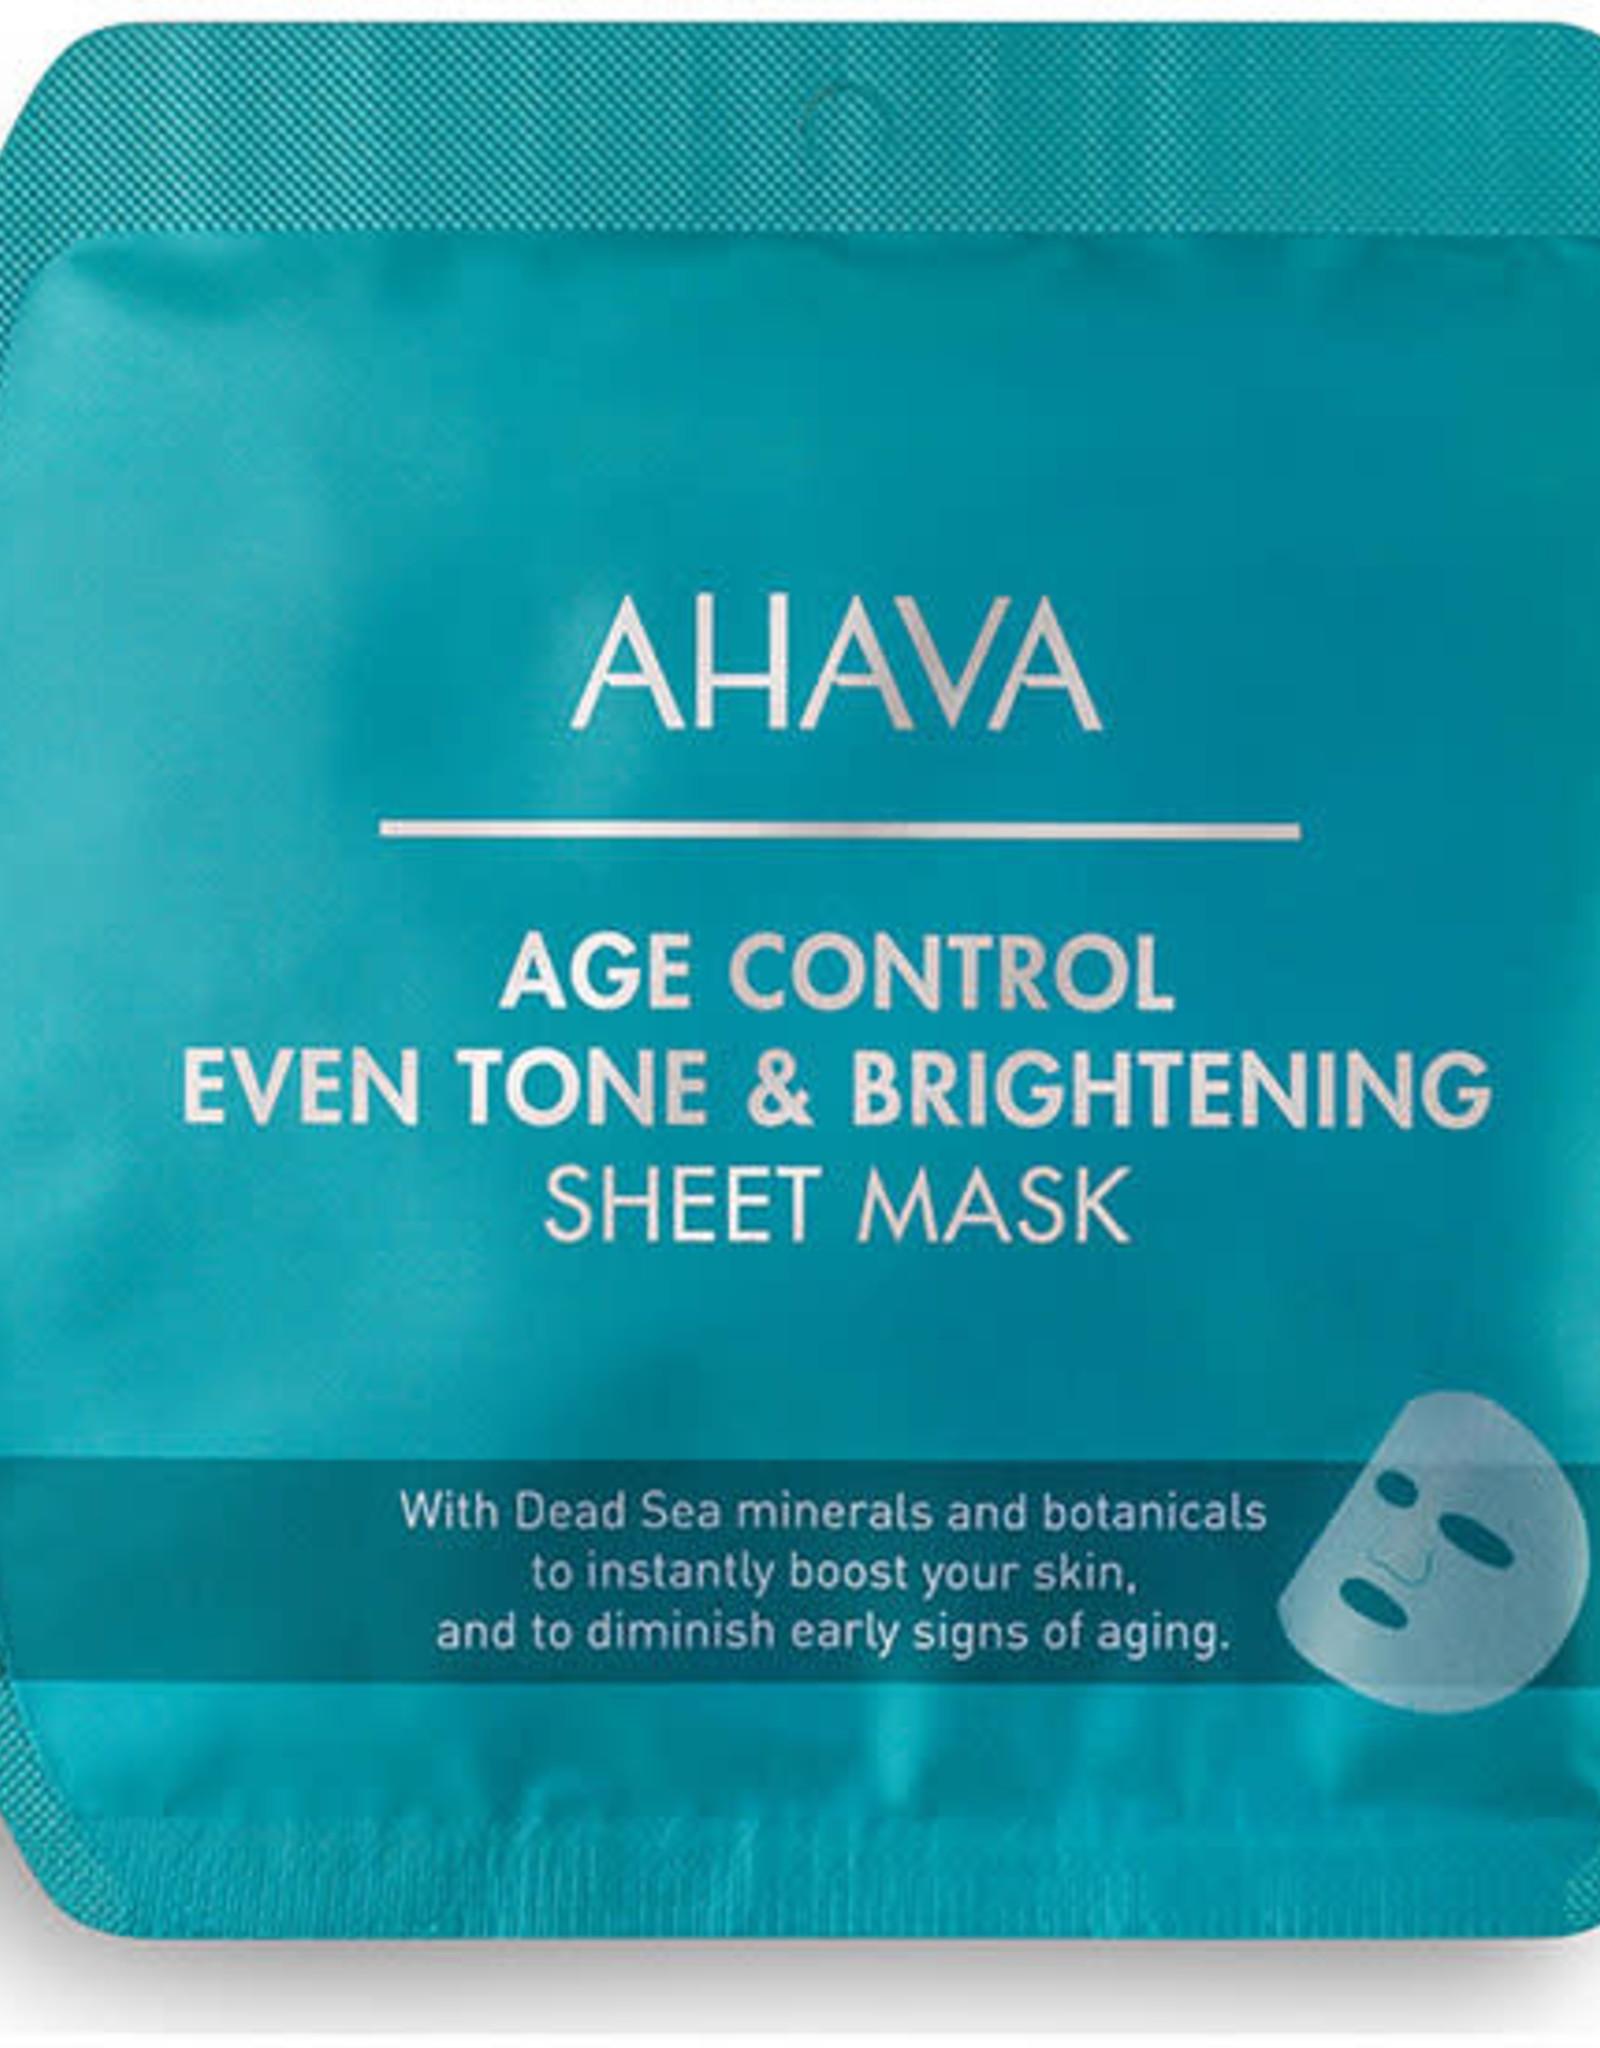 AHAVA Even tone brightening sheet mask